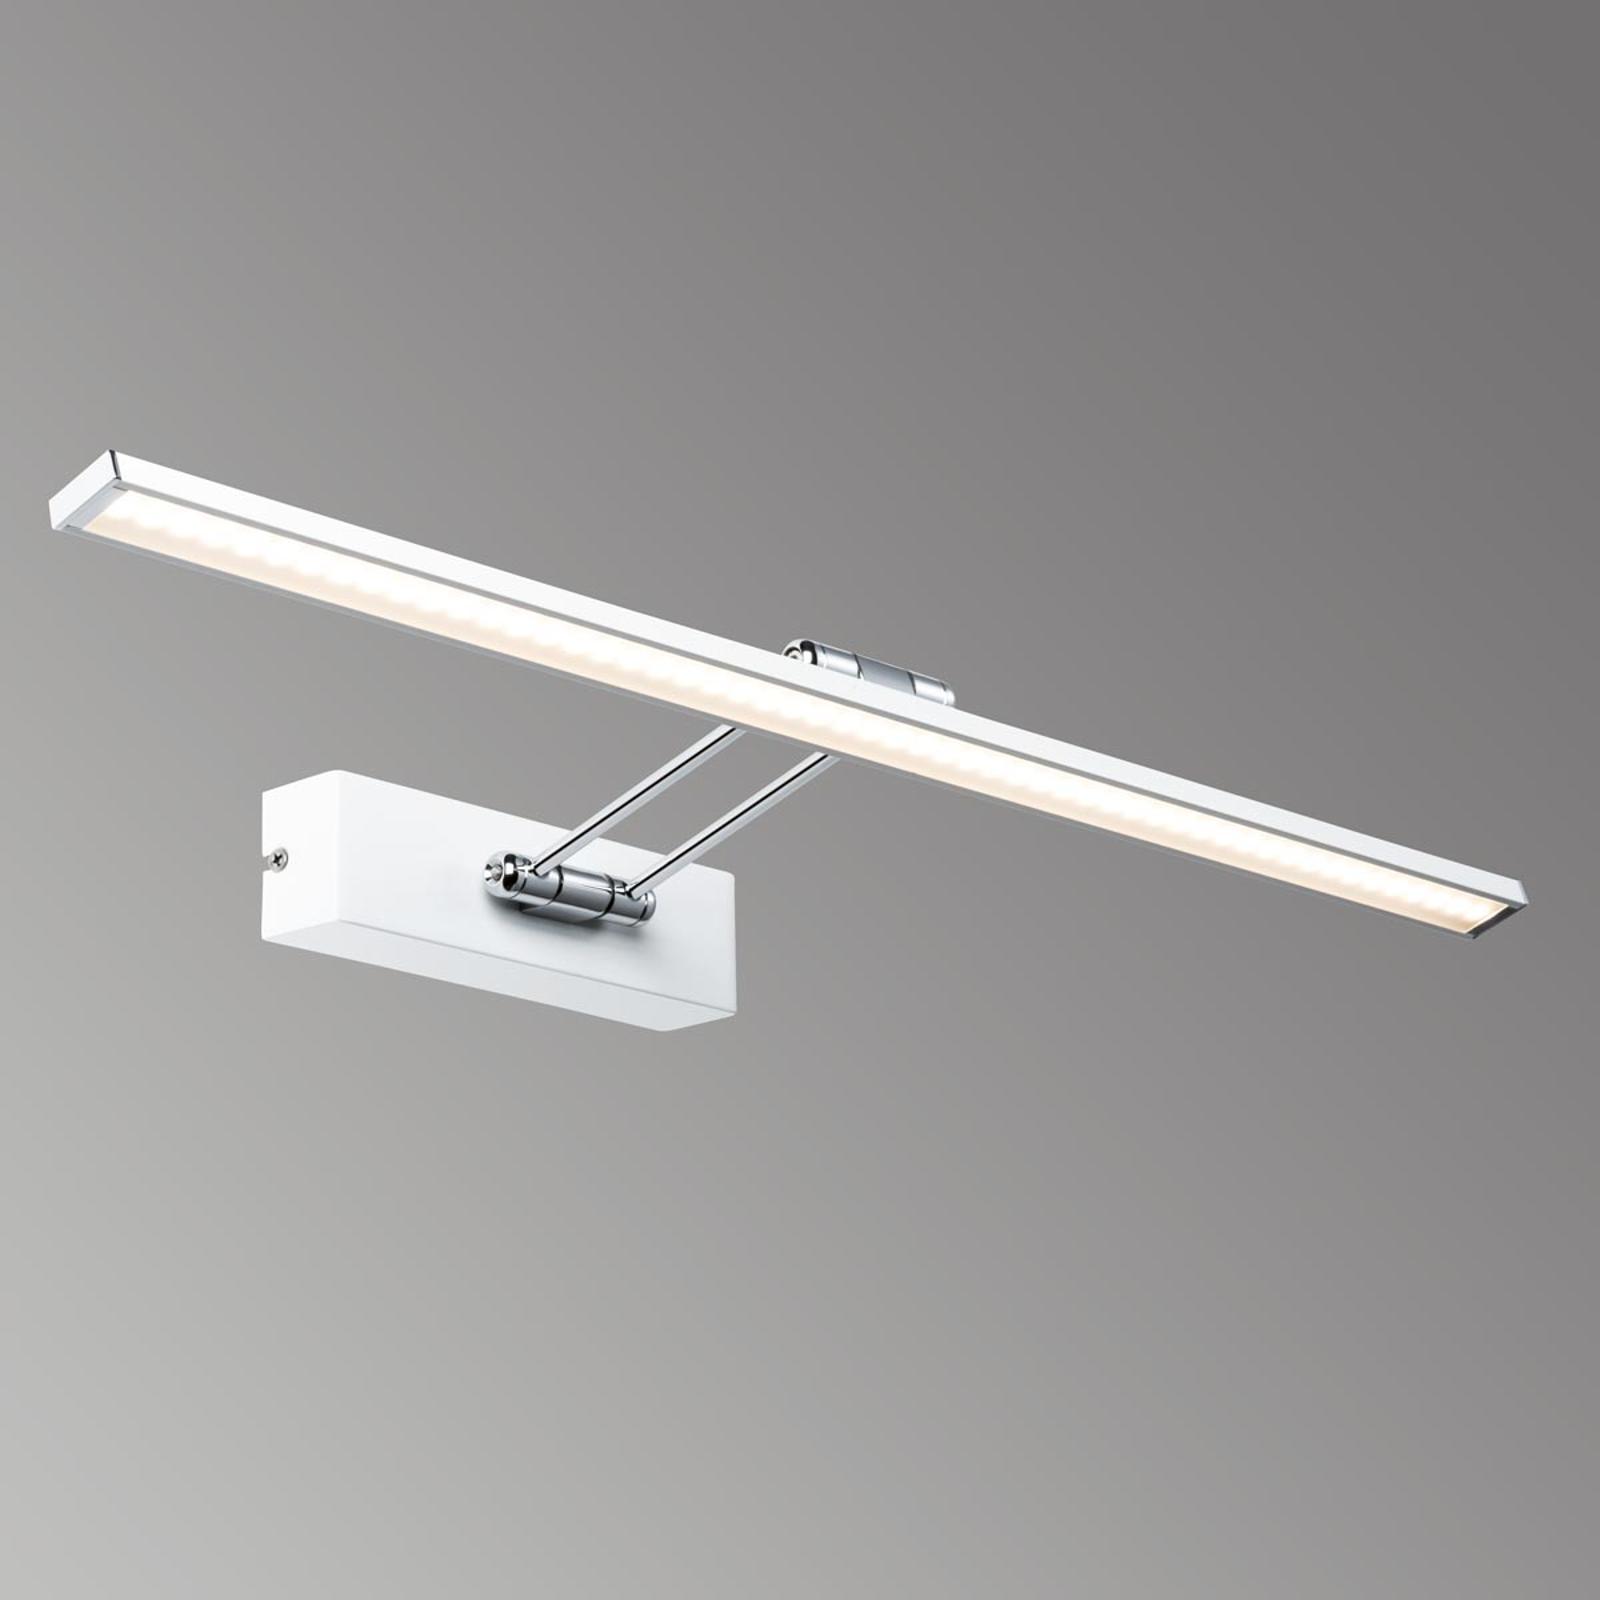 Spot LED da quadro Galeria Beam Sixty bianco